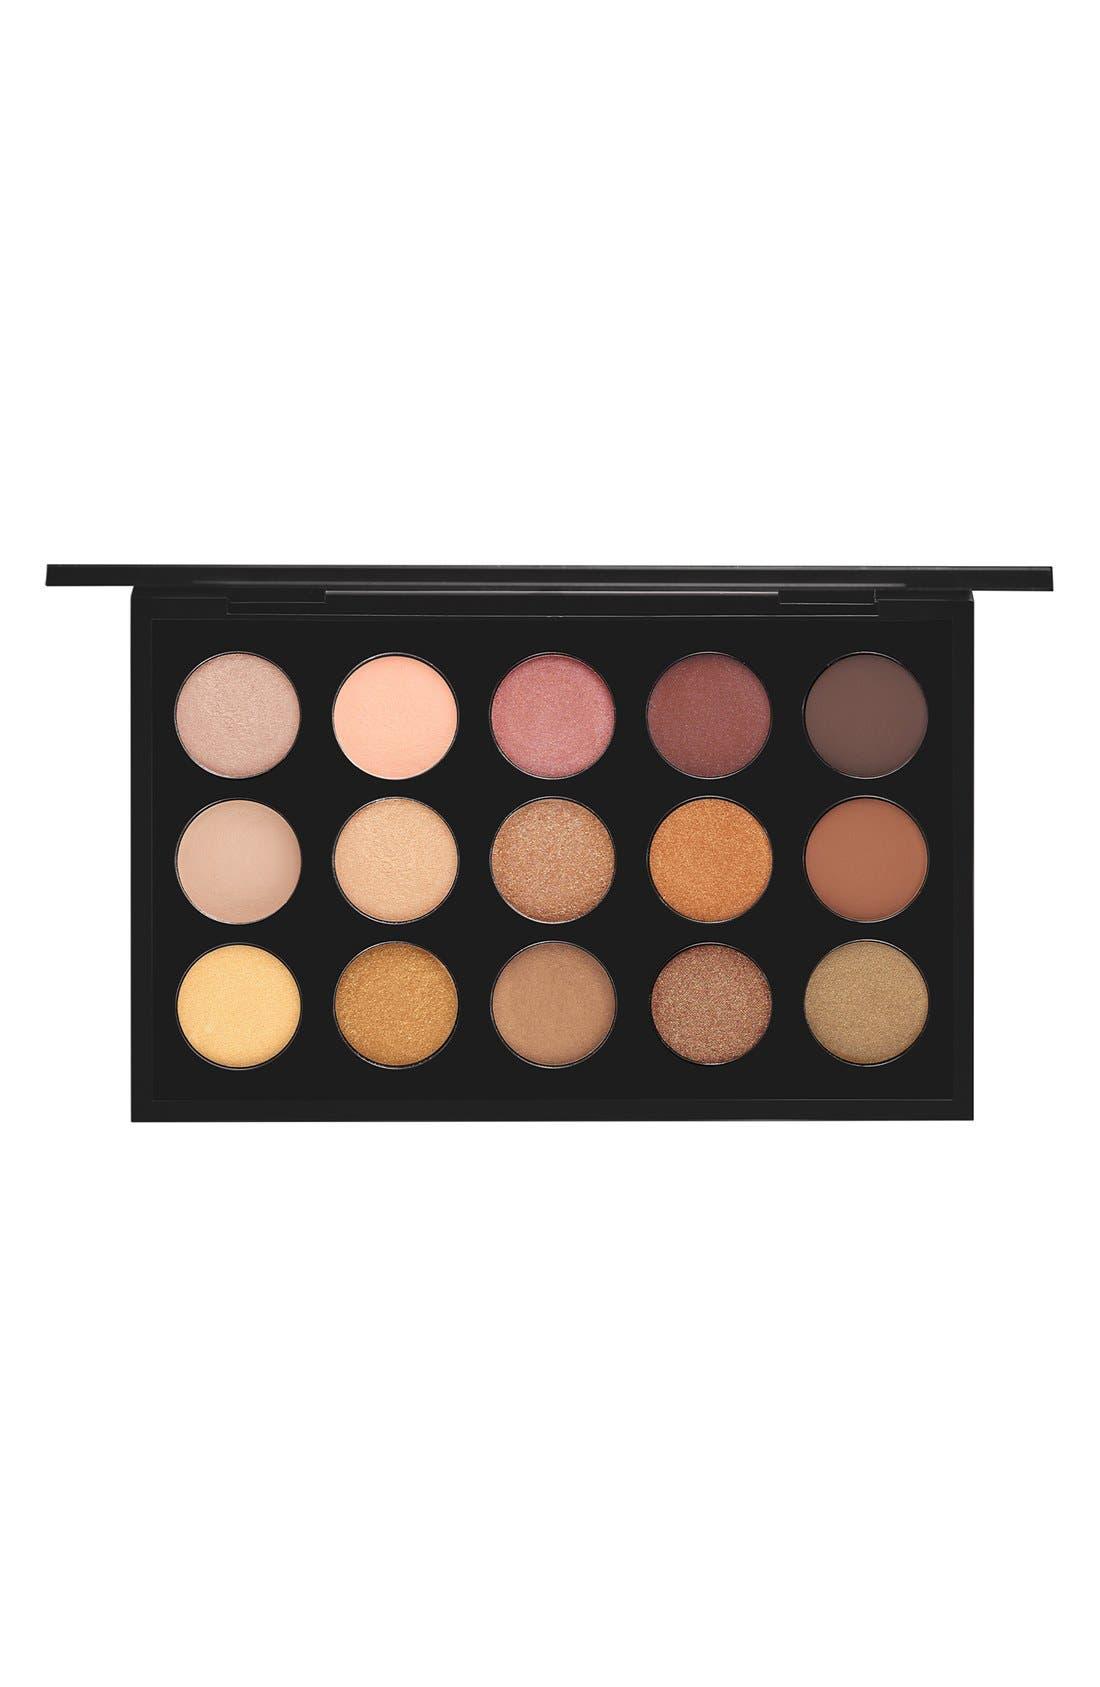 MAC Warm Neutral Times 15 Eyeshadow Palette